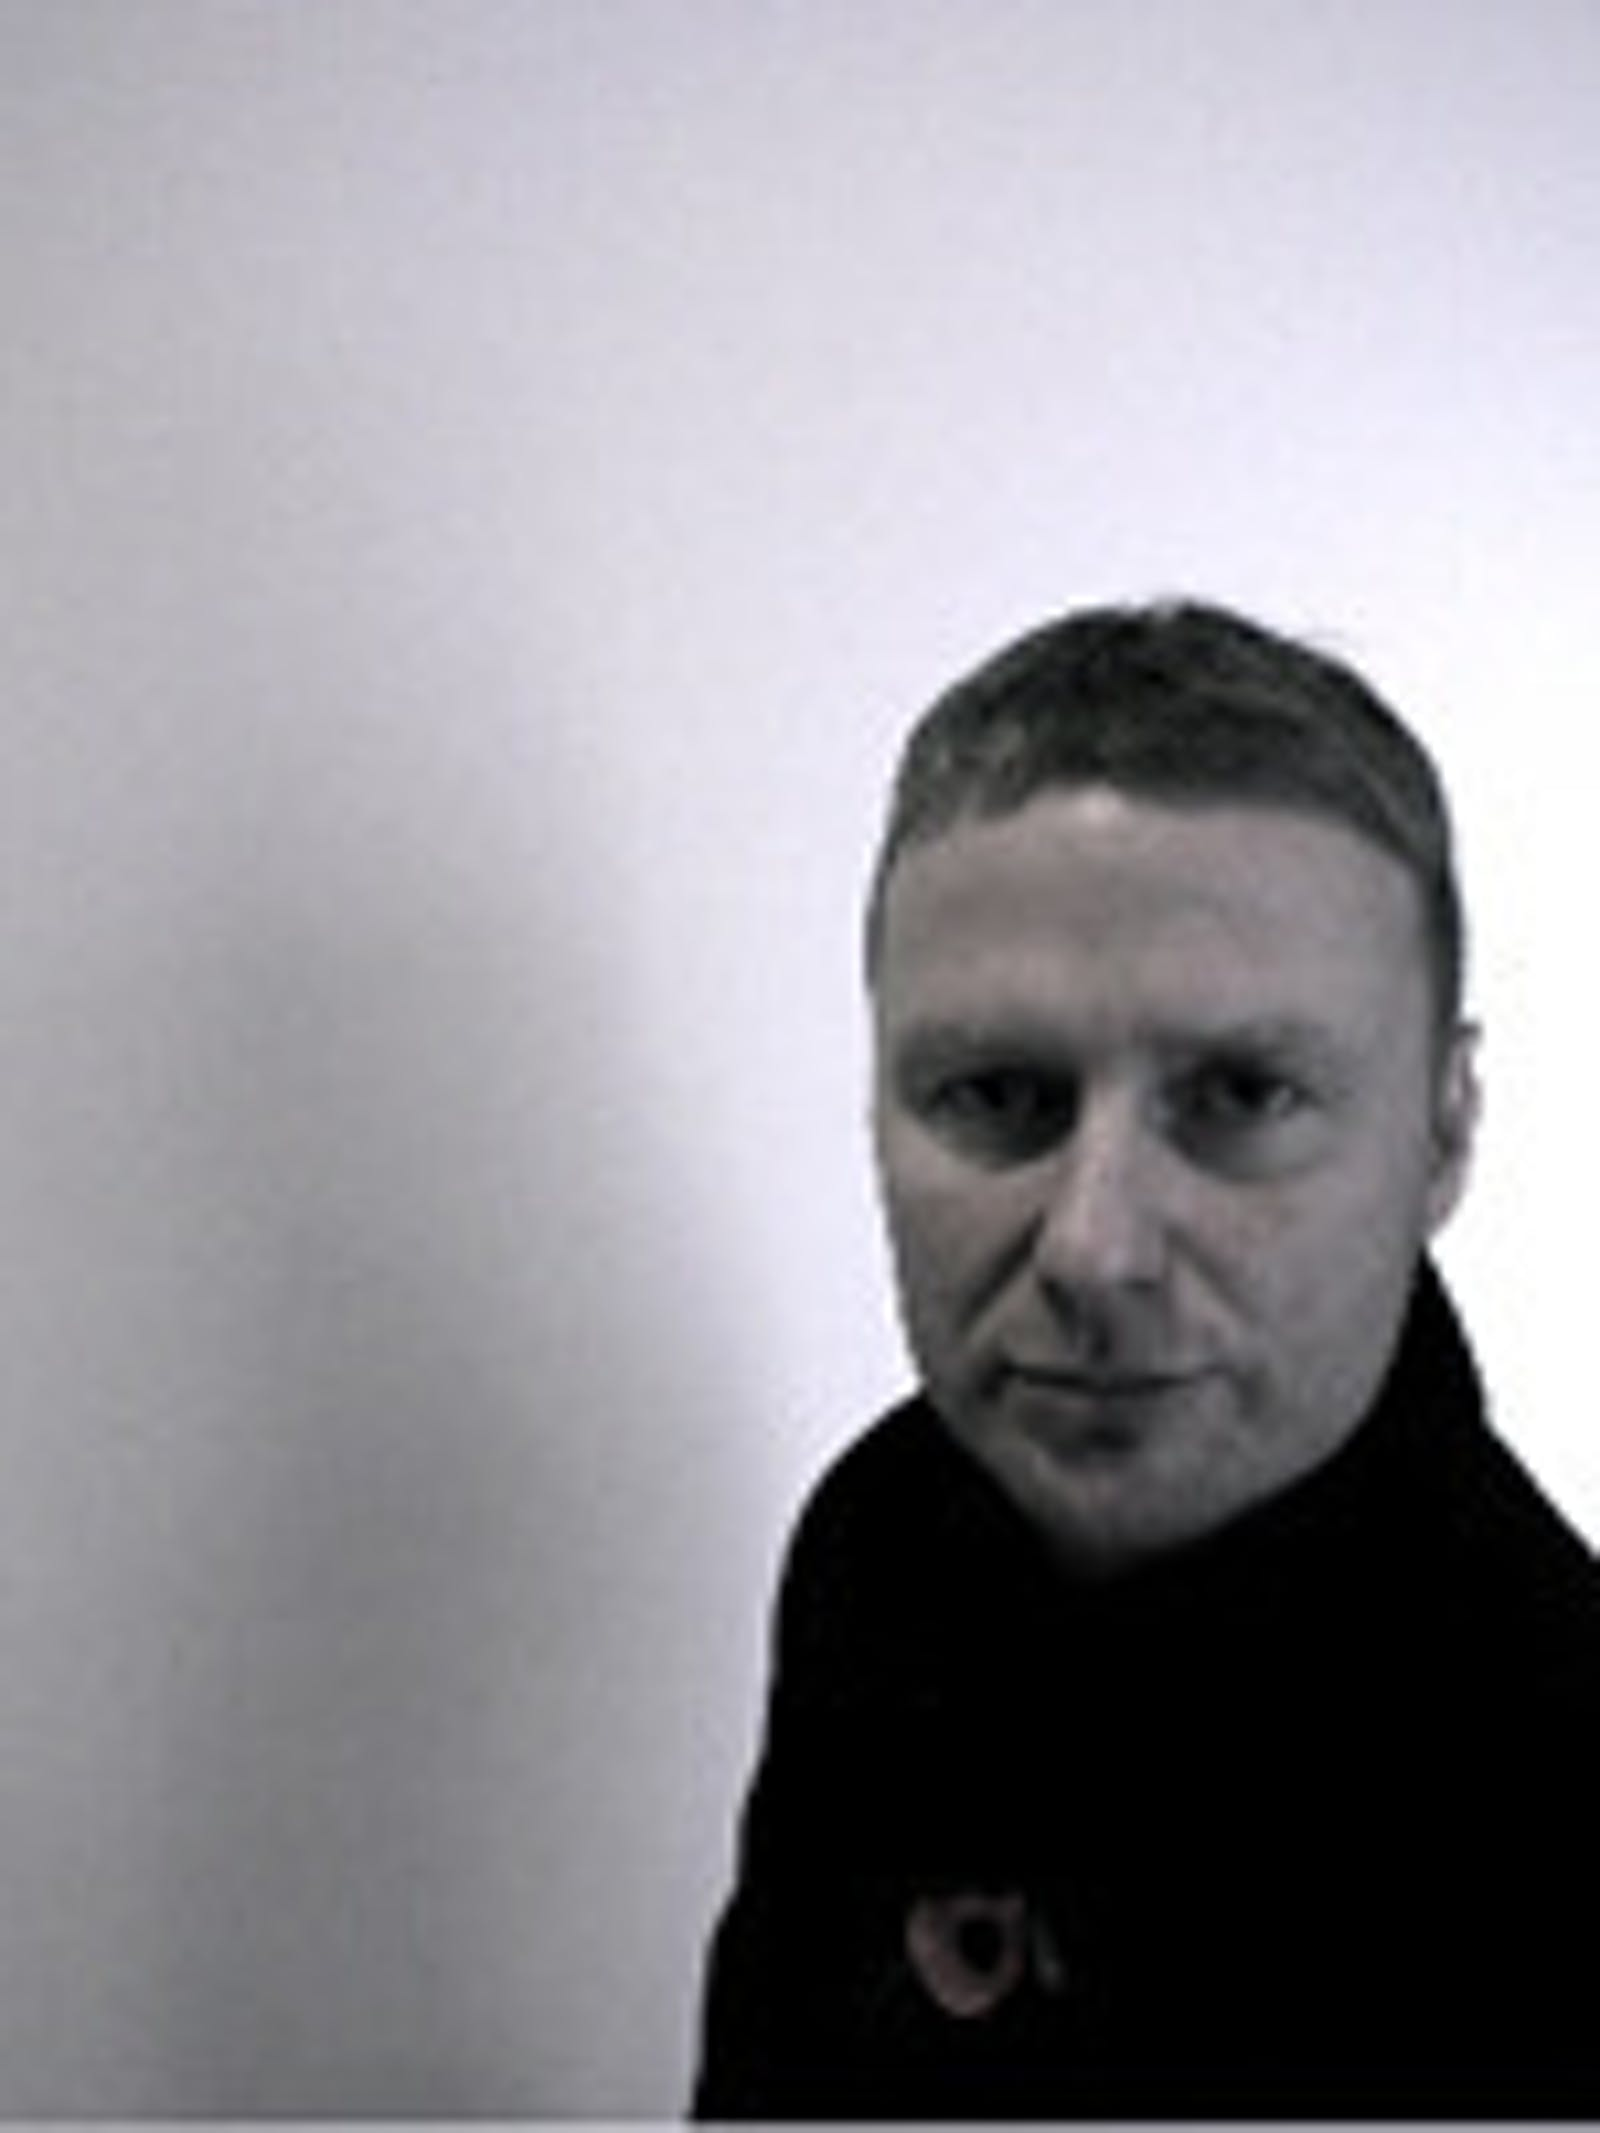 Matt Greenhalgh